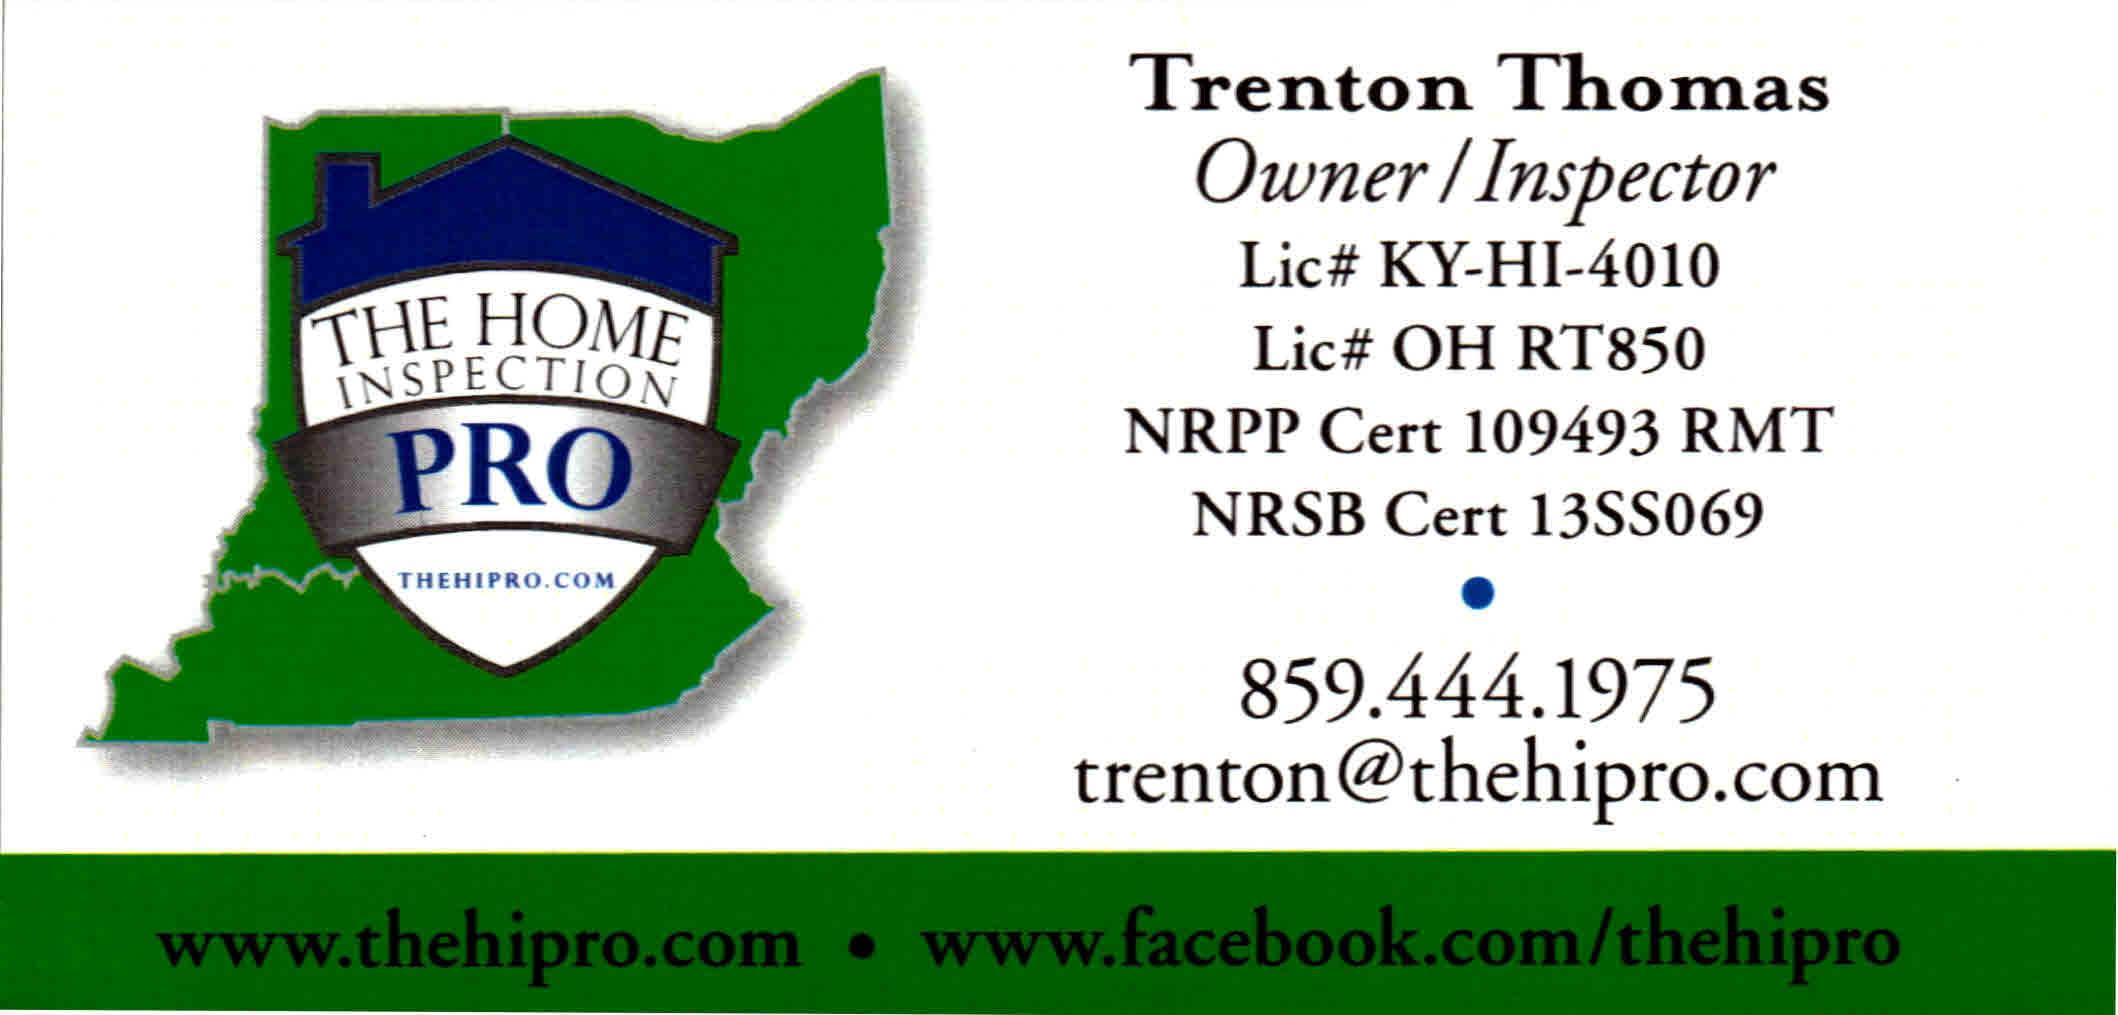 Trenton Thomas 2.jpg